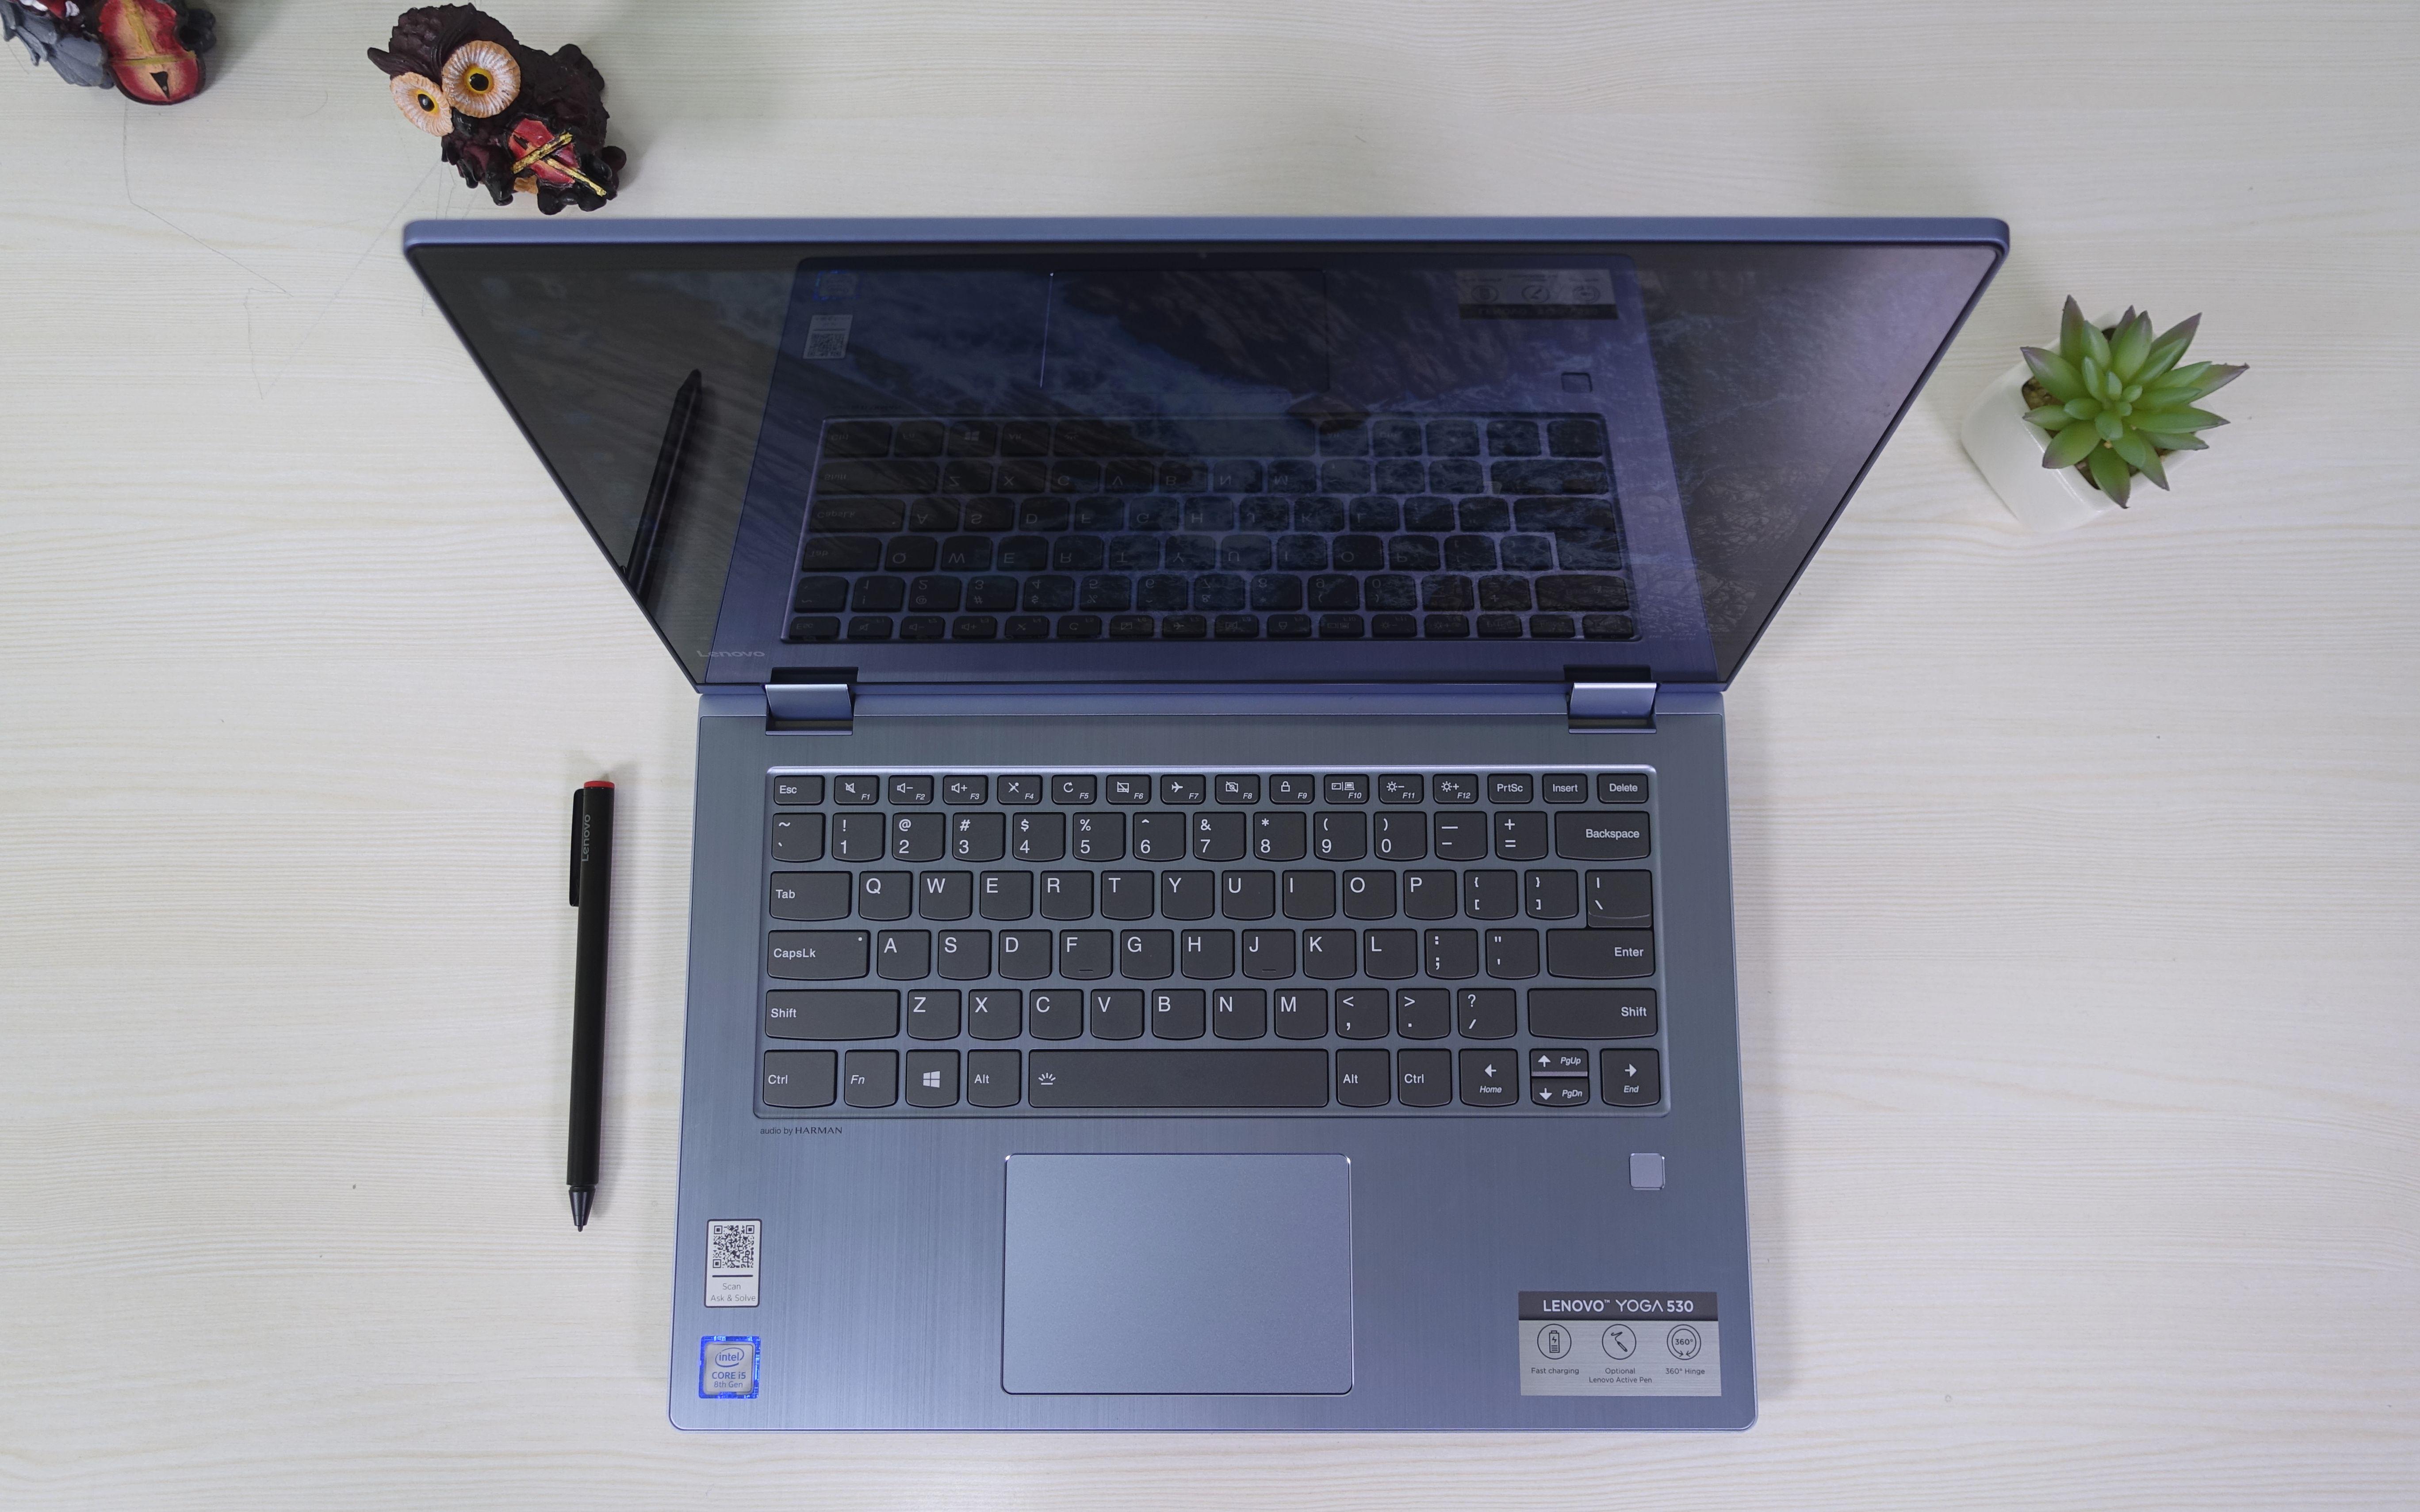 Lenovo Yoga 530 Review: A Portable Powerhouse On A Budget